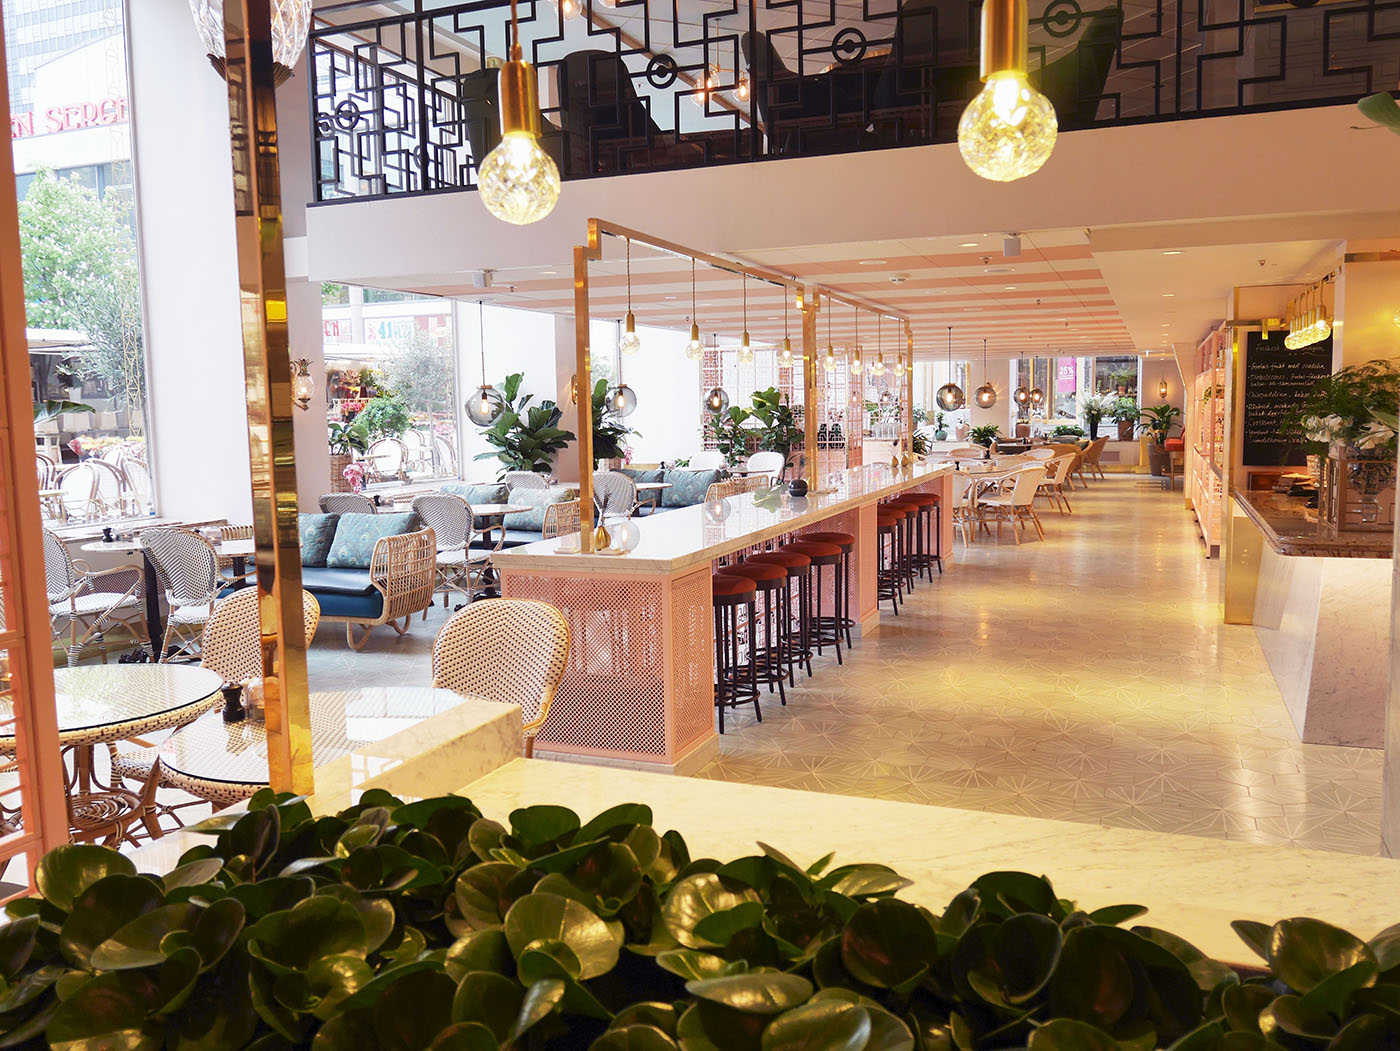 haymarket_frukost_stockholm